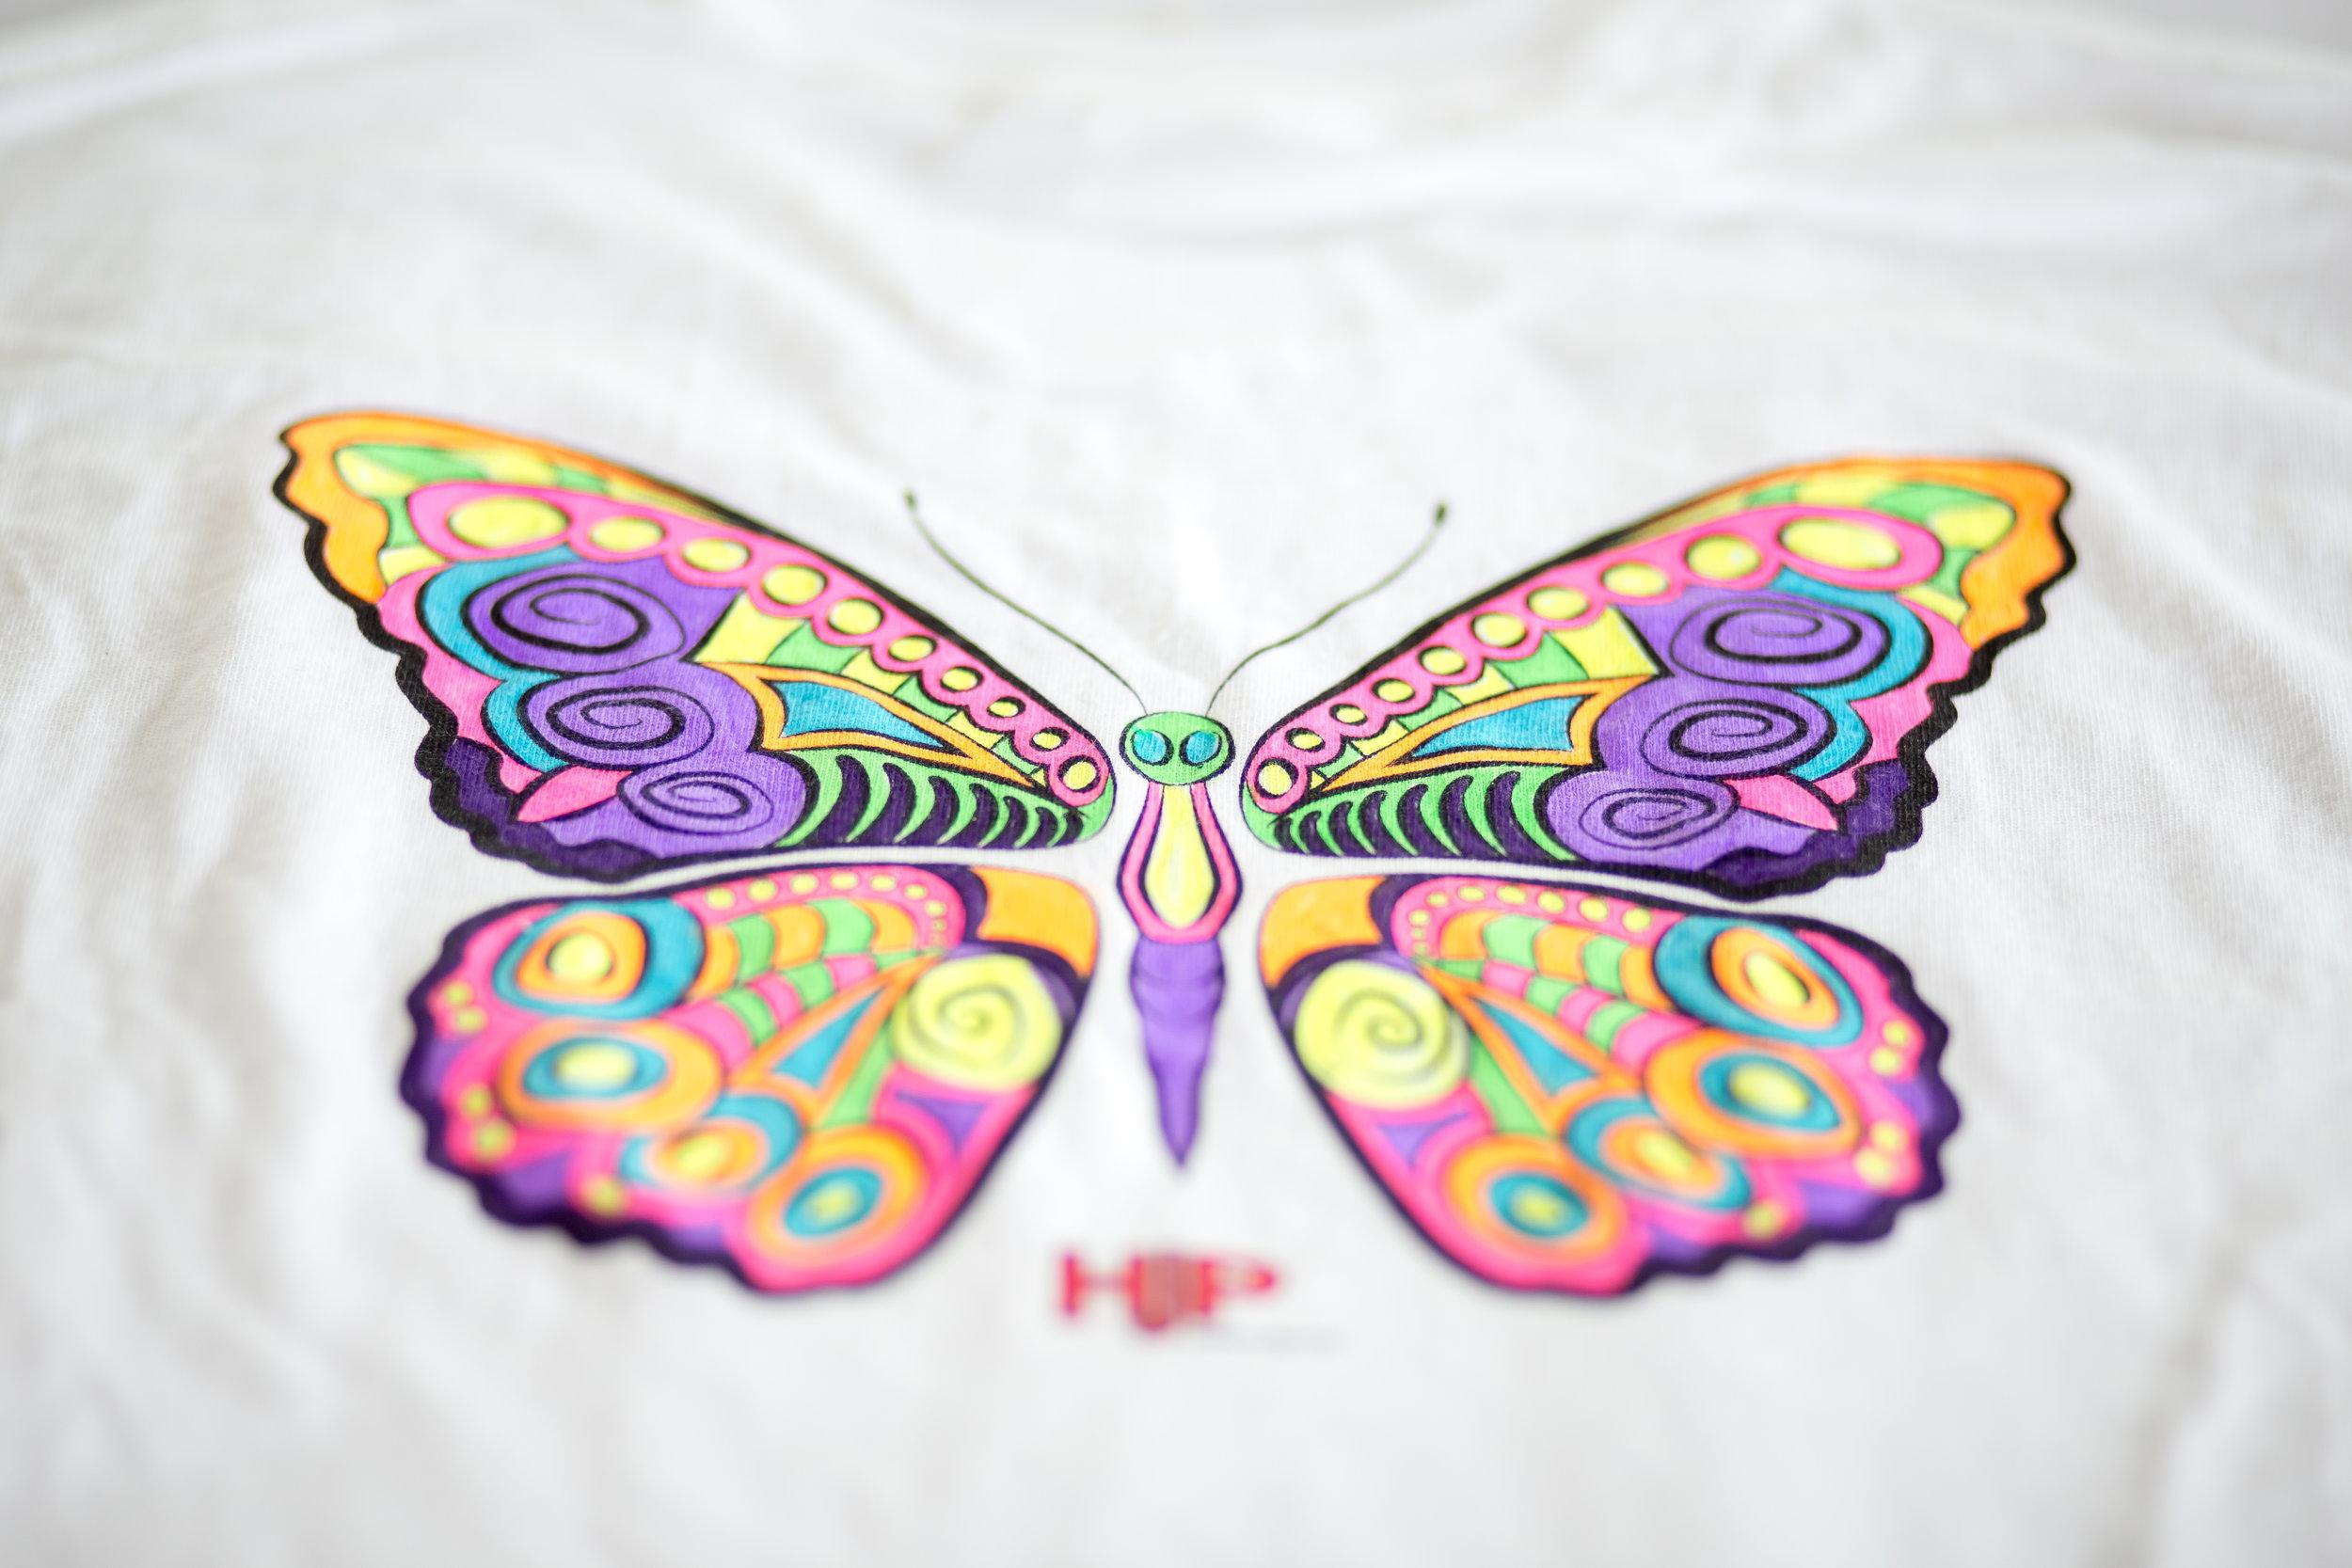 Hoosier Jiffy Print: Zentangle T-Shirt